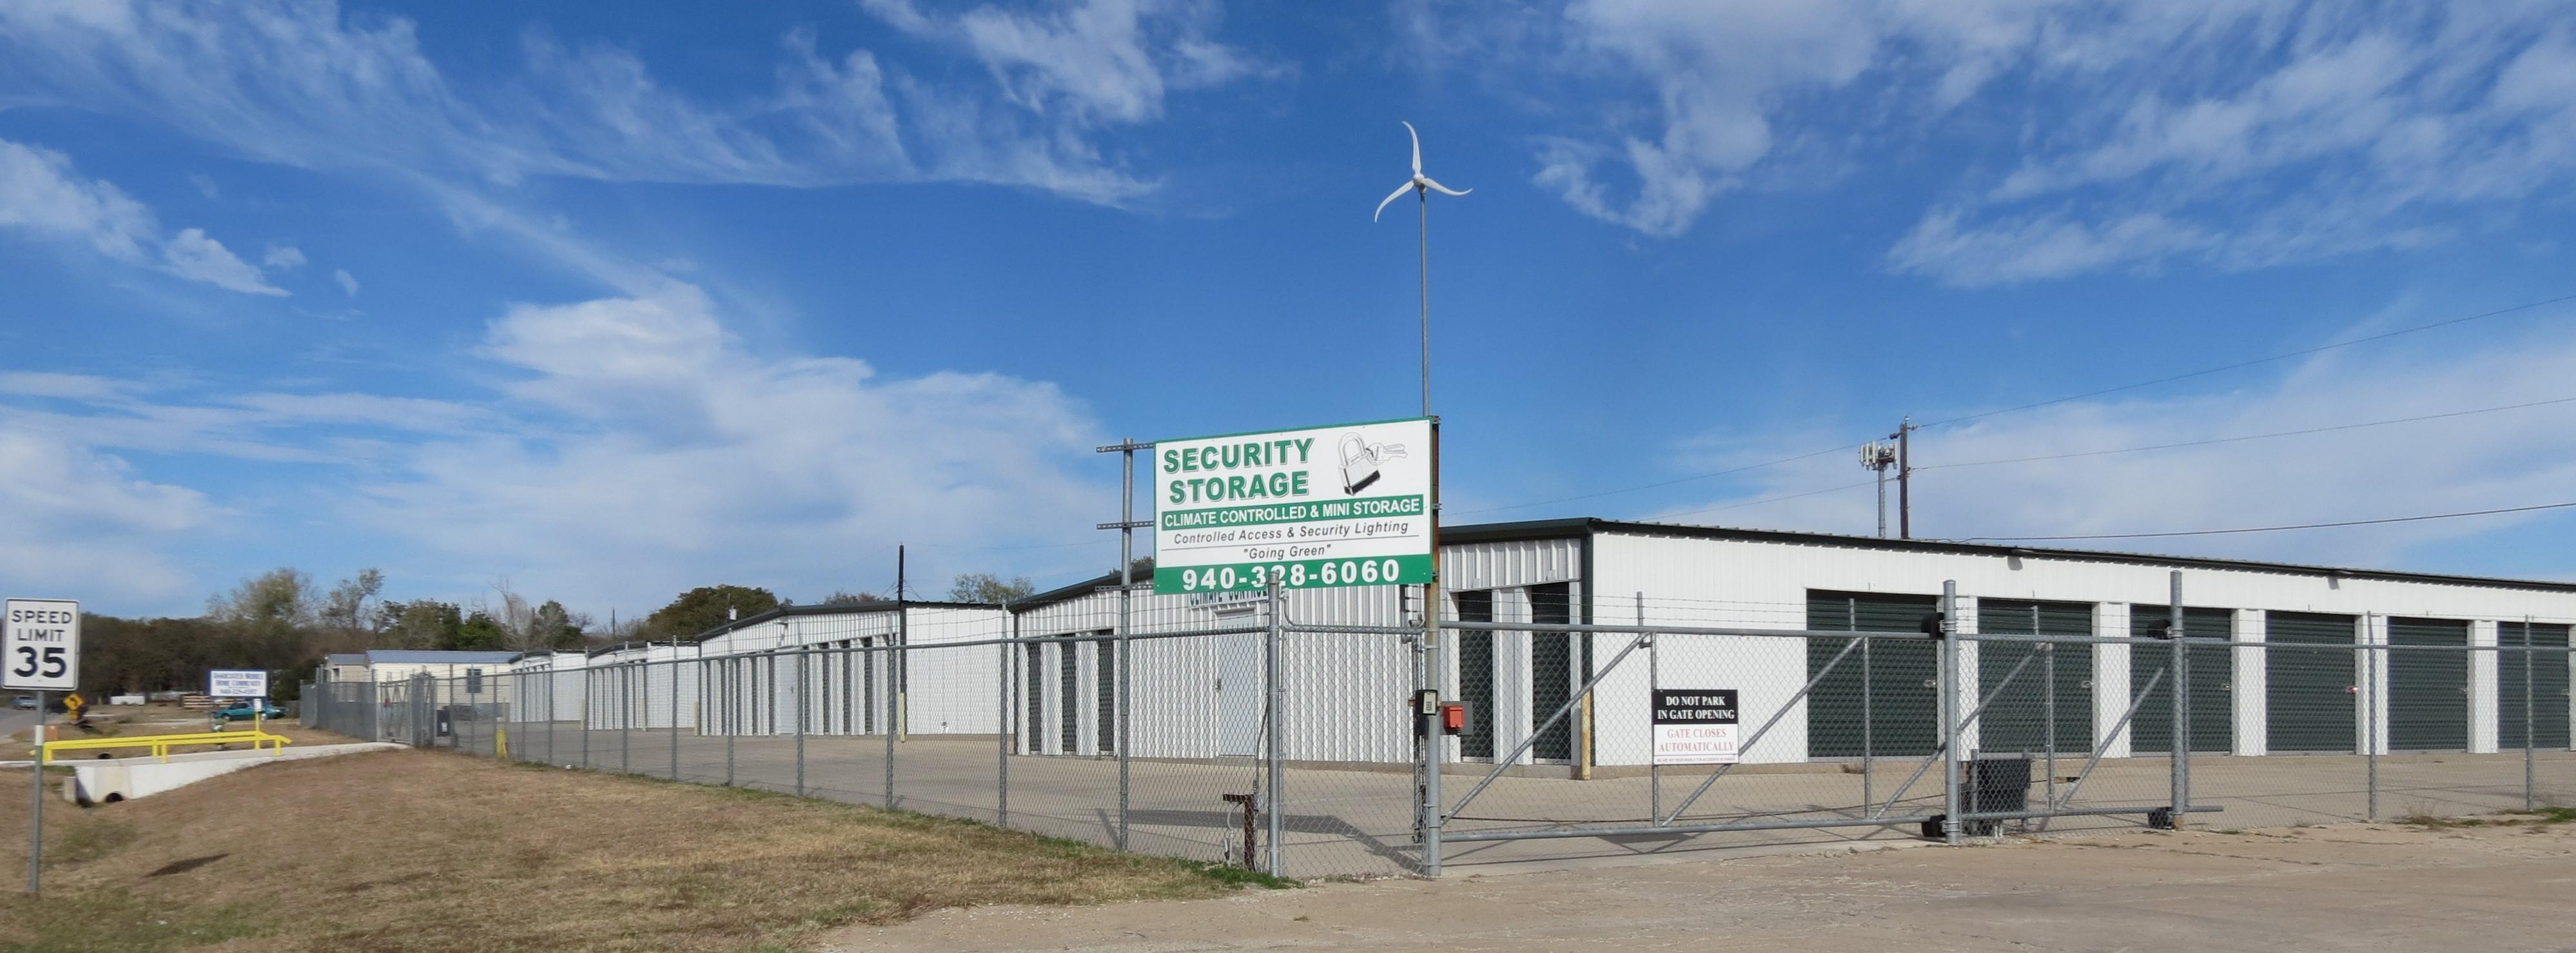 Security Storage image 1